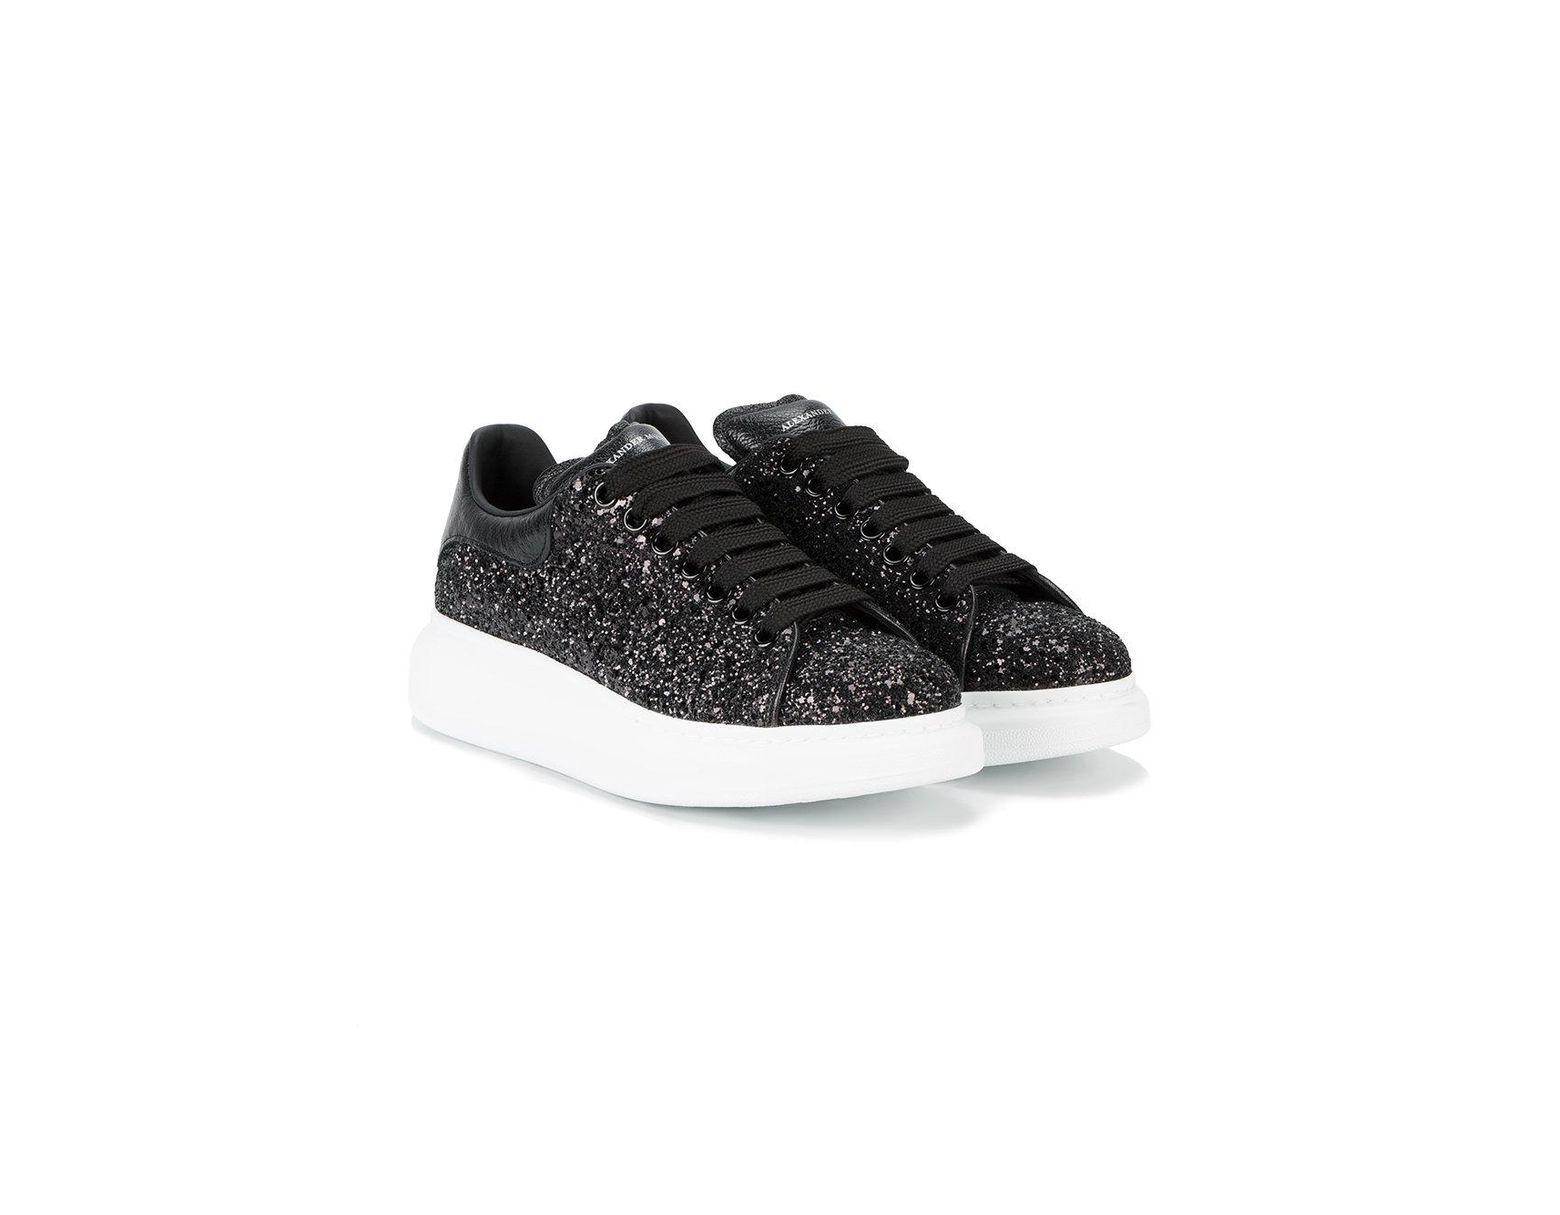 37124d054696 Alexander McQueen Black Glitter Platform Sneakers in Black - Save 15% - Lyst